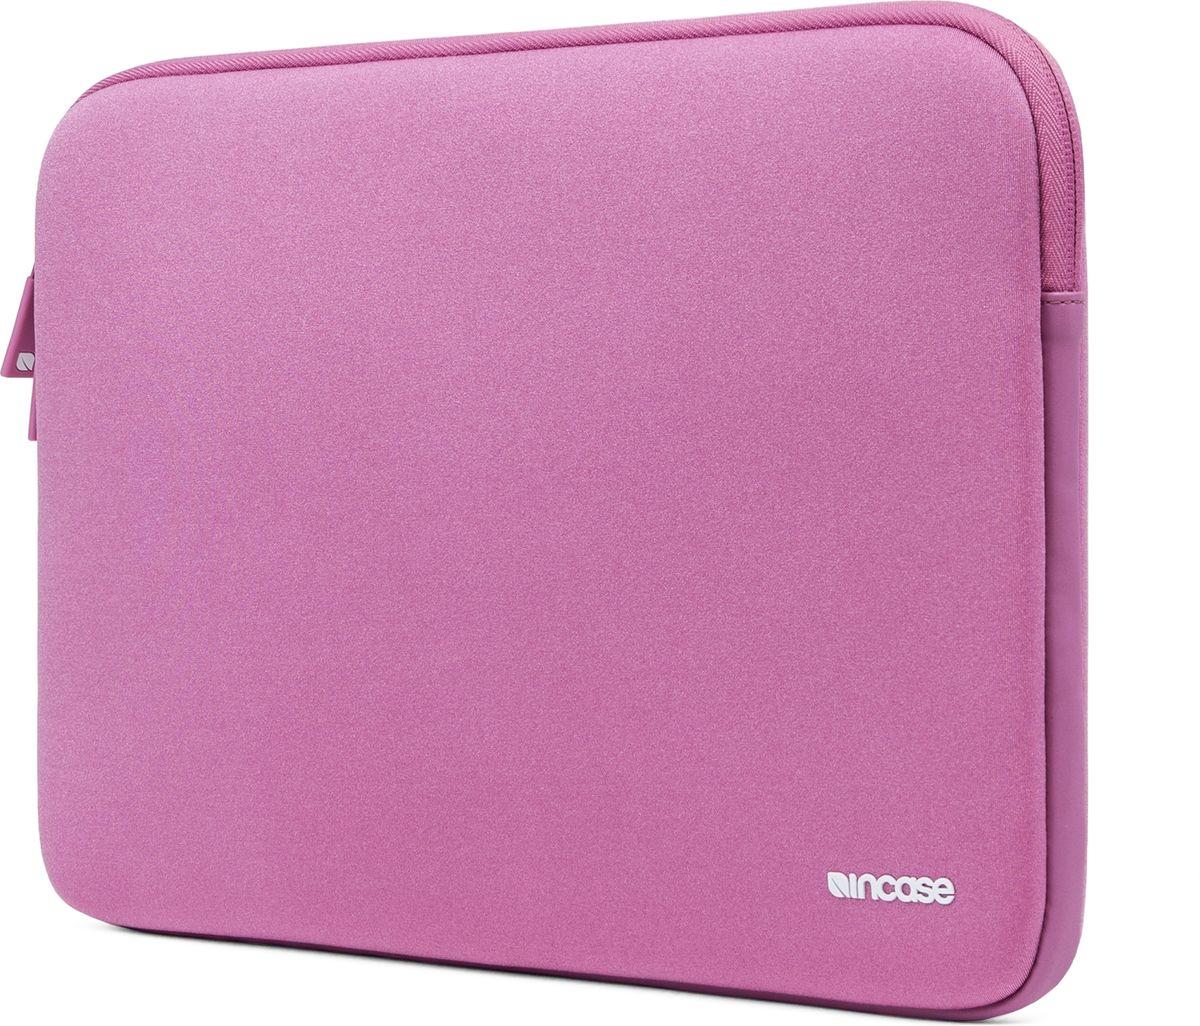 "Incase Neoprene Classic Sleeve чехол для Apple MacBook 12"", Orchid CL90042"